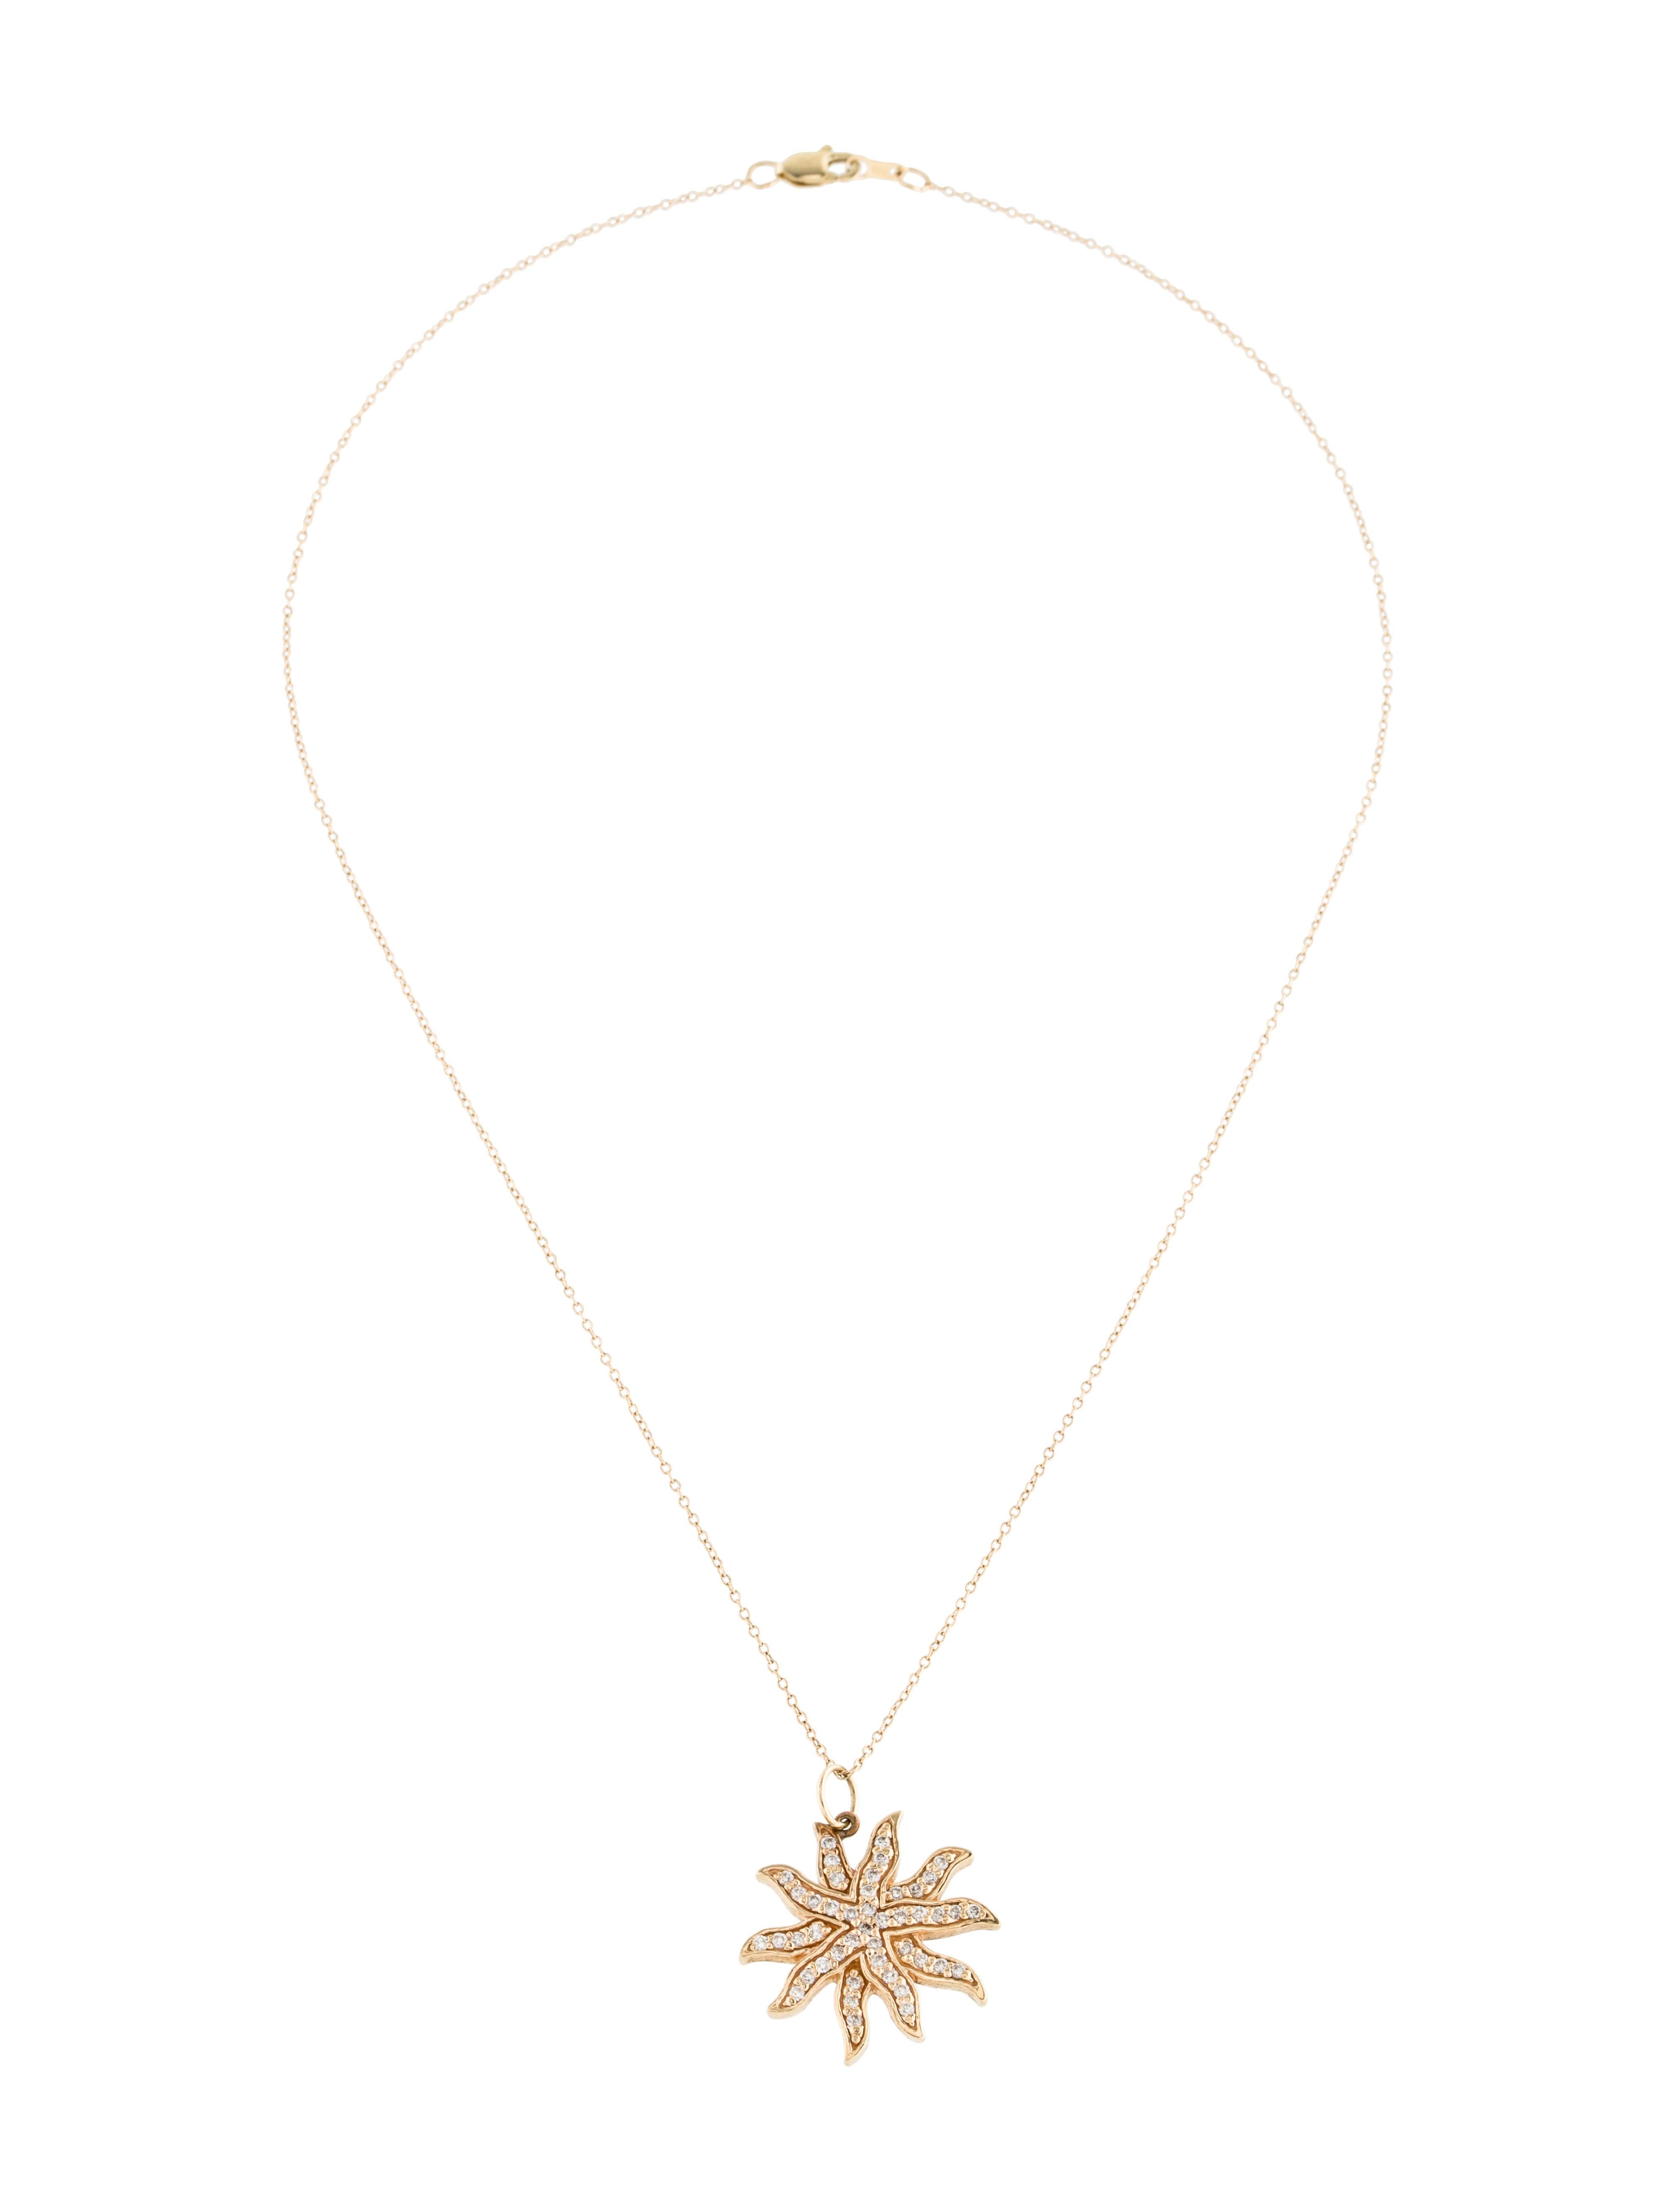 14k diamond star pendant necklace necklaces fjp21302 for Star hallmark on jewelry